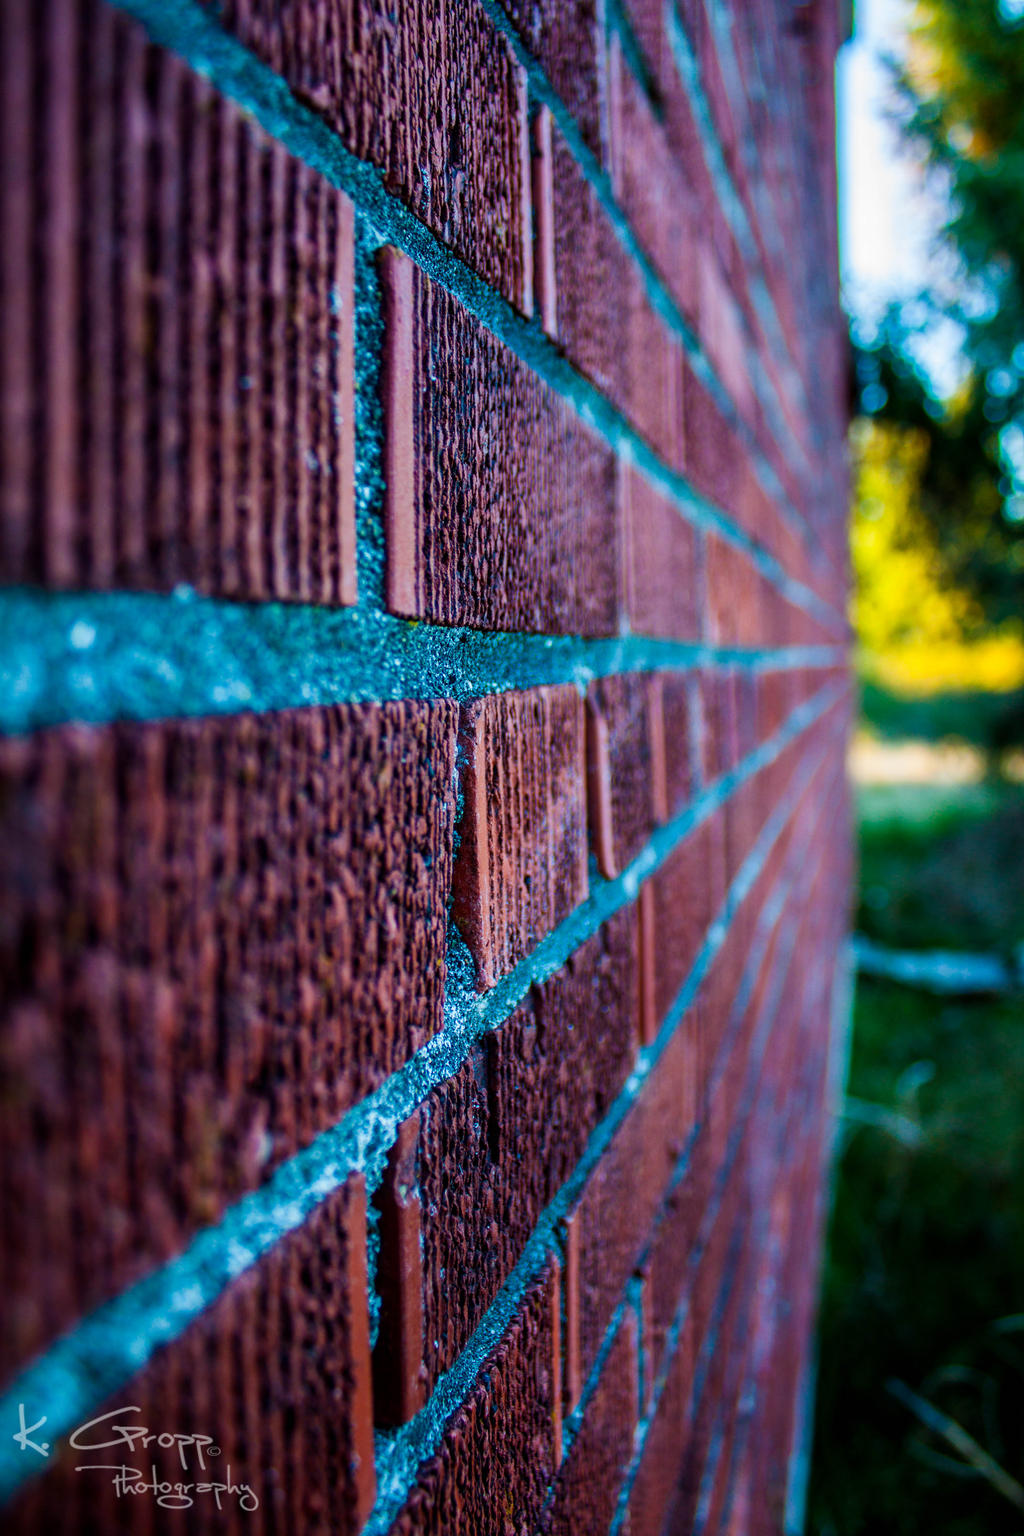 Brickwork by ackbad